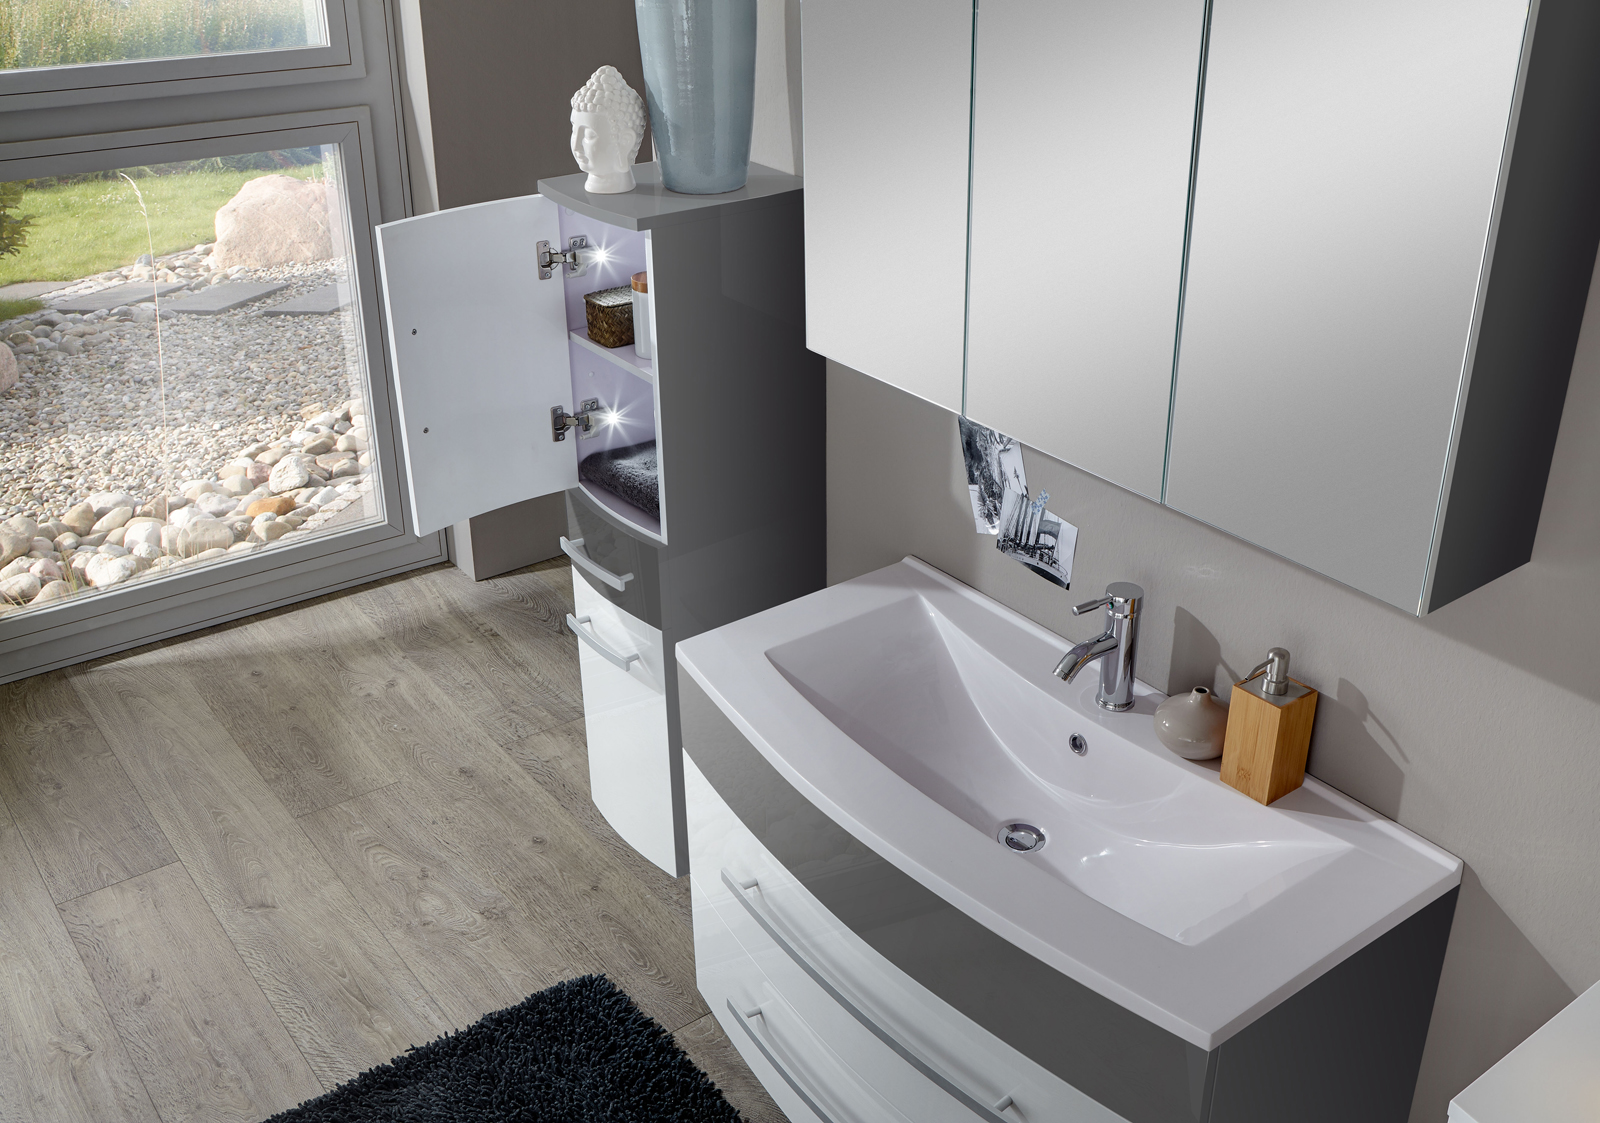 sam 4tlg badezimmer set hochglanz wei grau 90cm genf. Black Bedroom Furniture Sets. Home Design Ideas